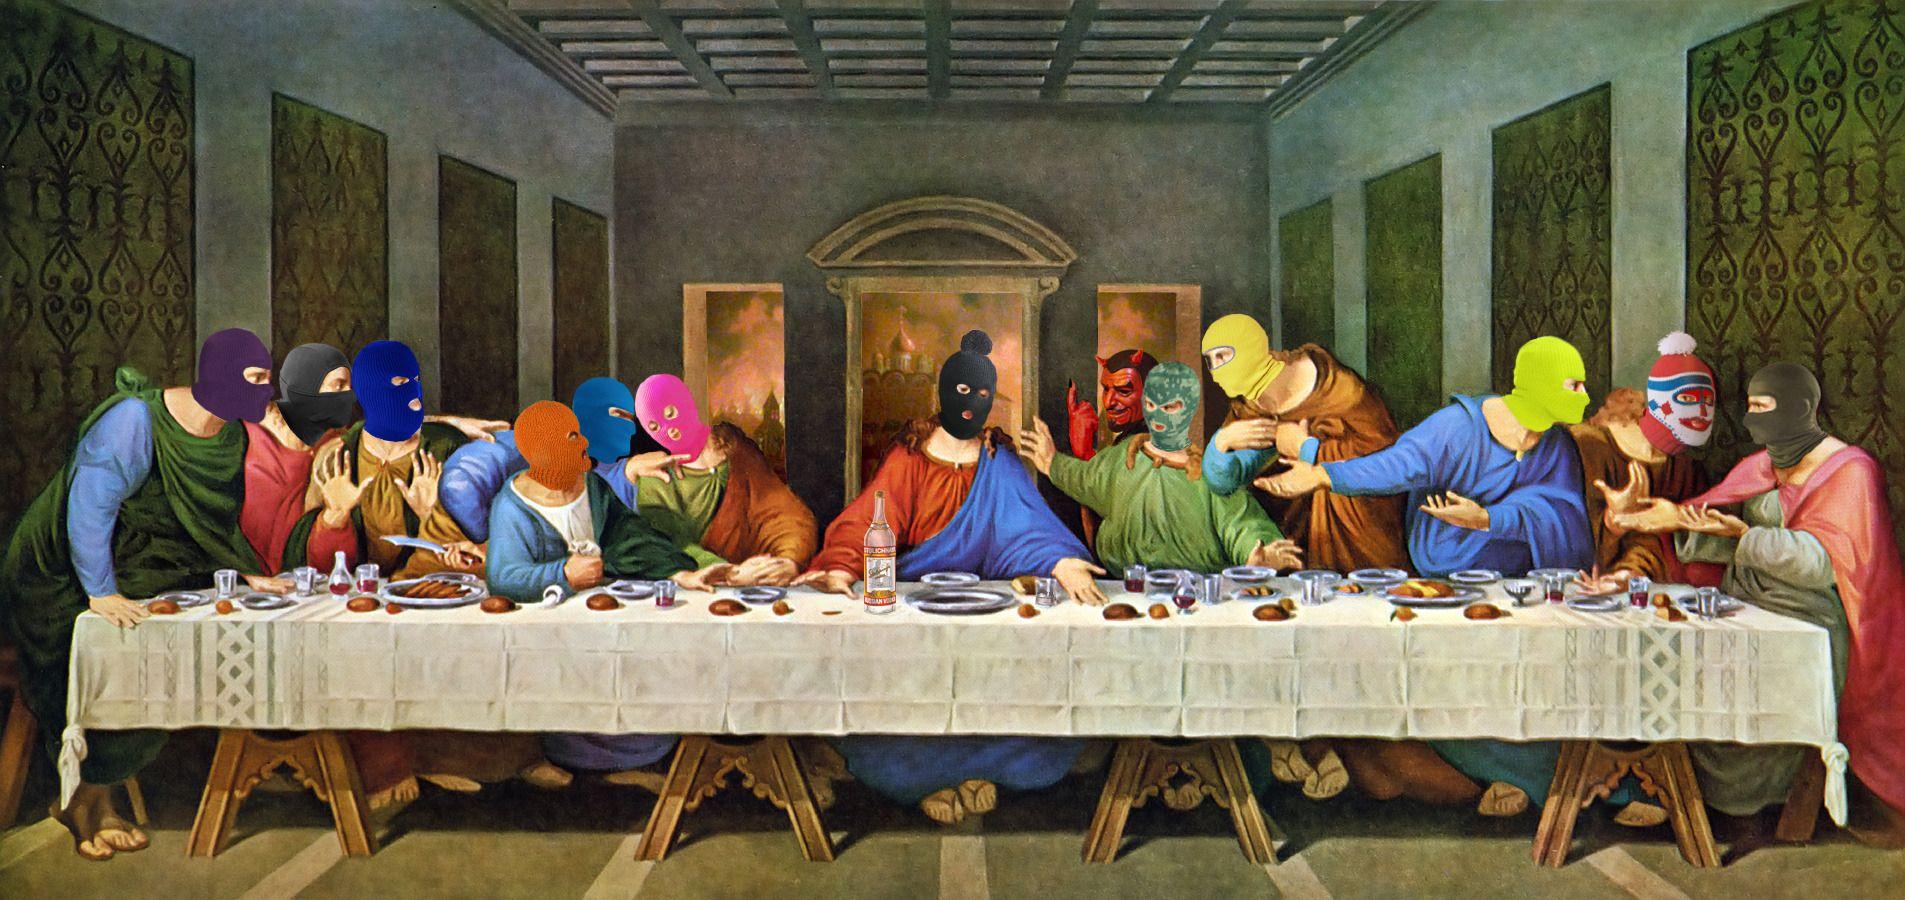 Gallery Ssur The Last Supper Painting Da Vinci Last Supper